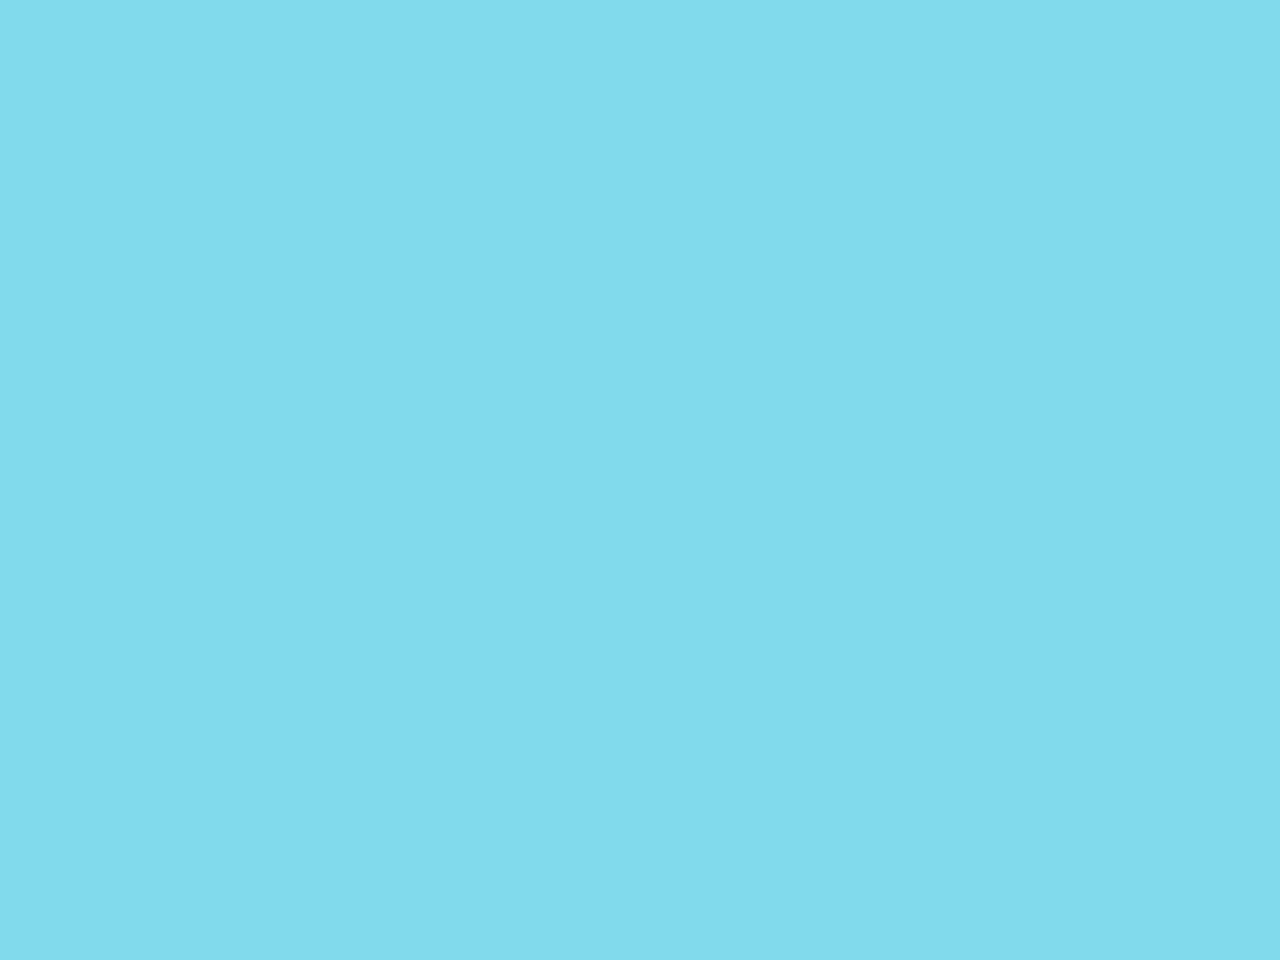 1280x960 Medium Sky Blue Solid Color Background